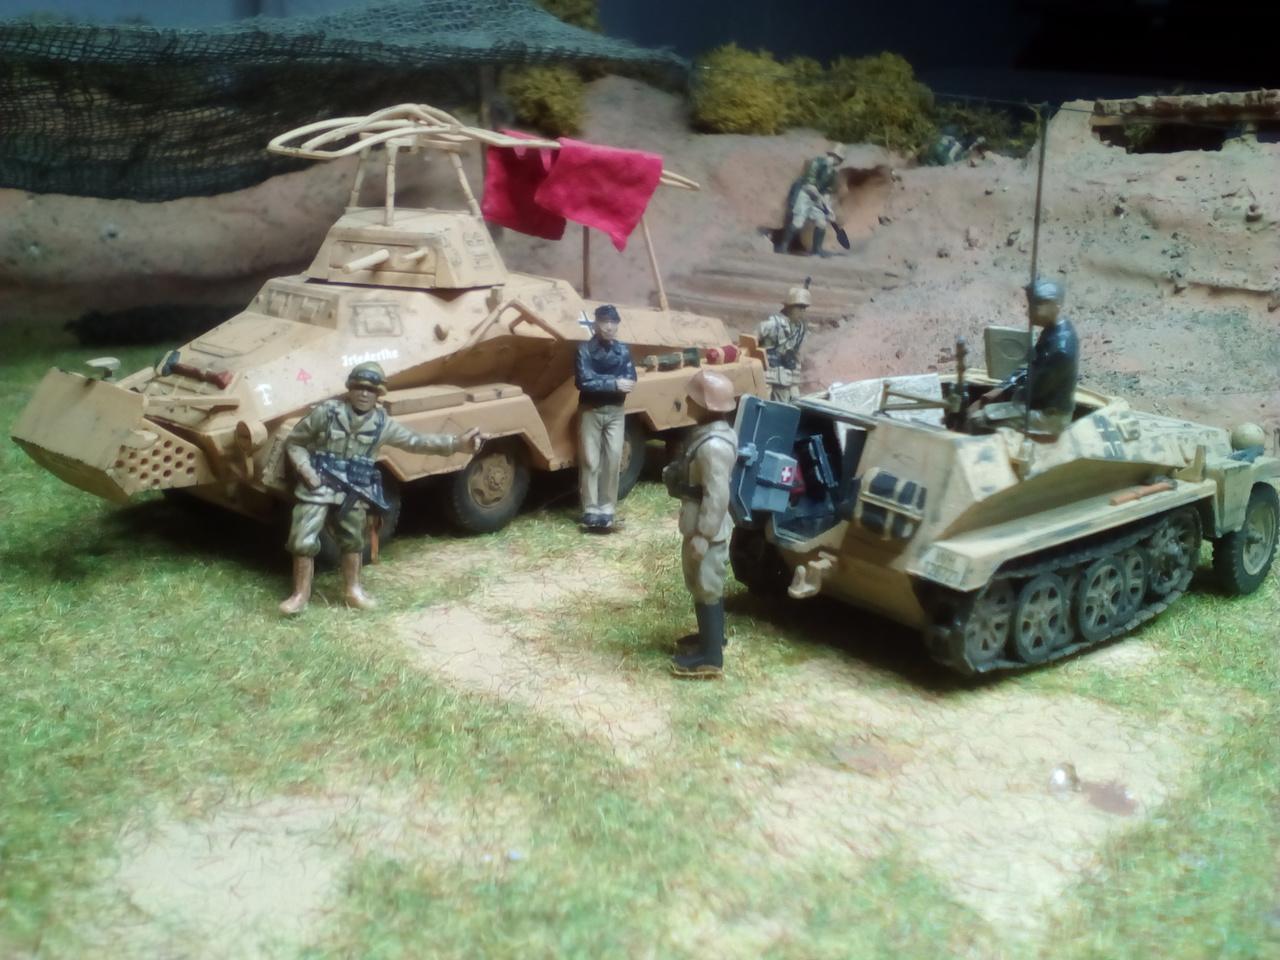 Armeeaufbau in gaaaaaaanz langsam.... - Seite 2 Img_20200329_19424143k6e